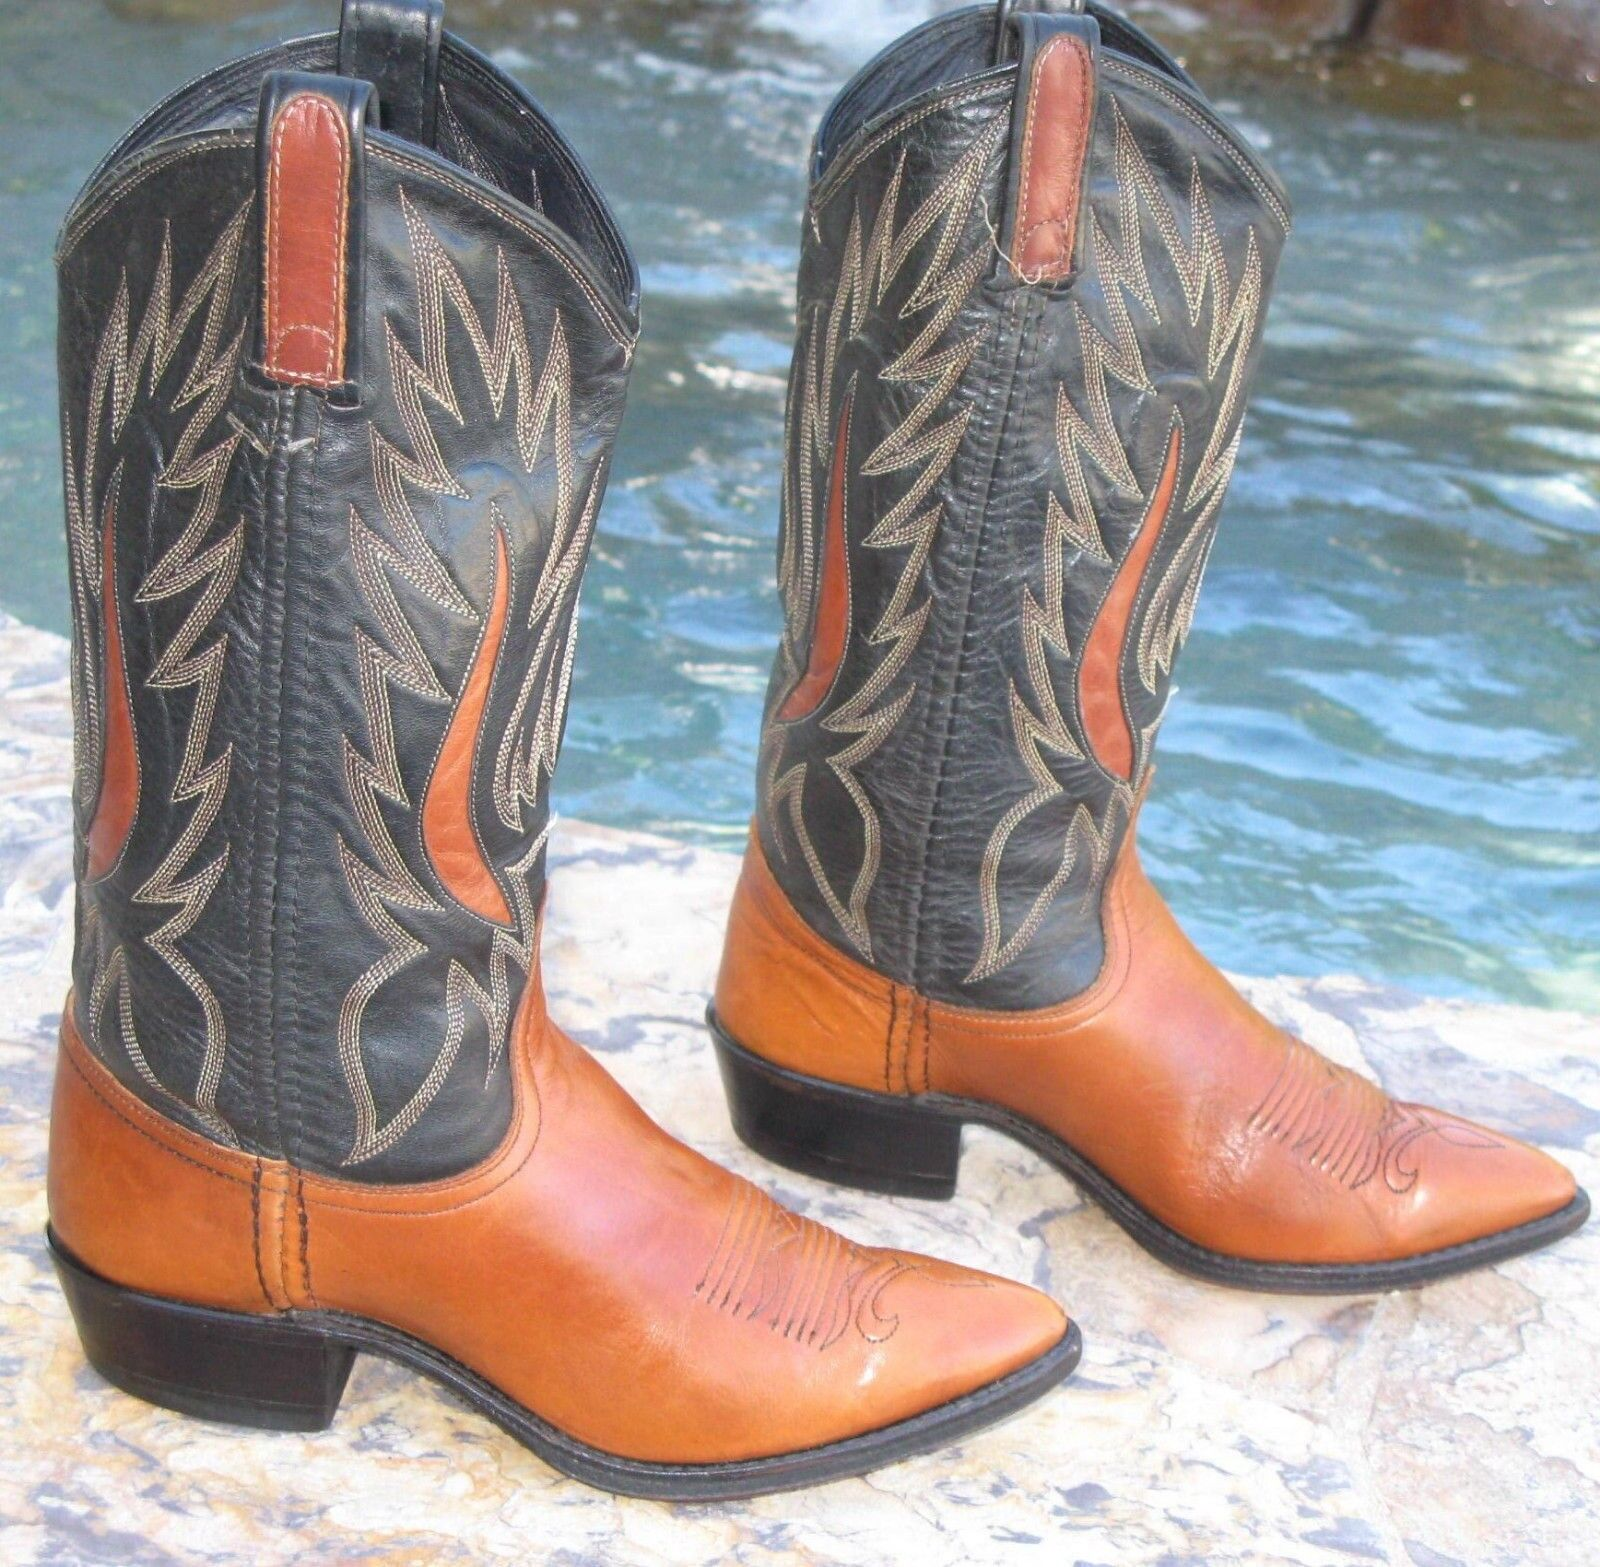 e96ecb9b1404ff Dan Dan Dan Post Bottes Cowboy Western Femme Taille 6/6.5 M Brun Noir    Vendre Prix 319ec0